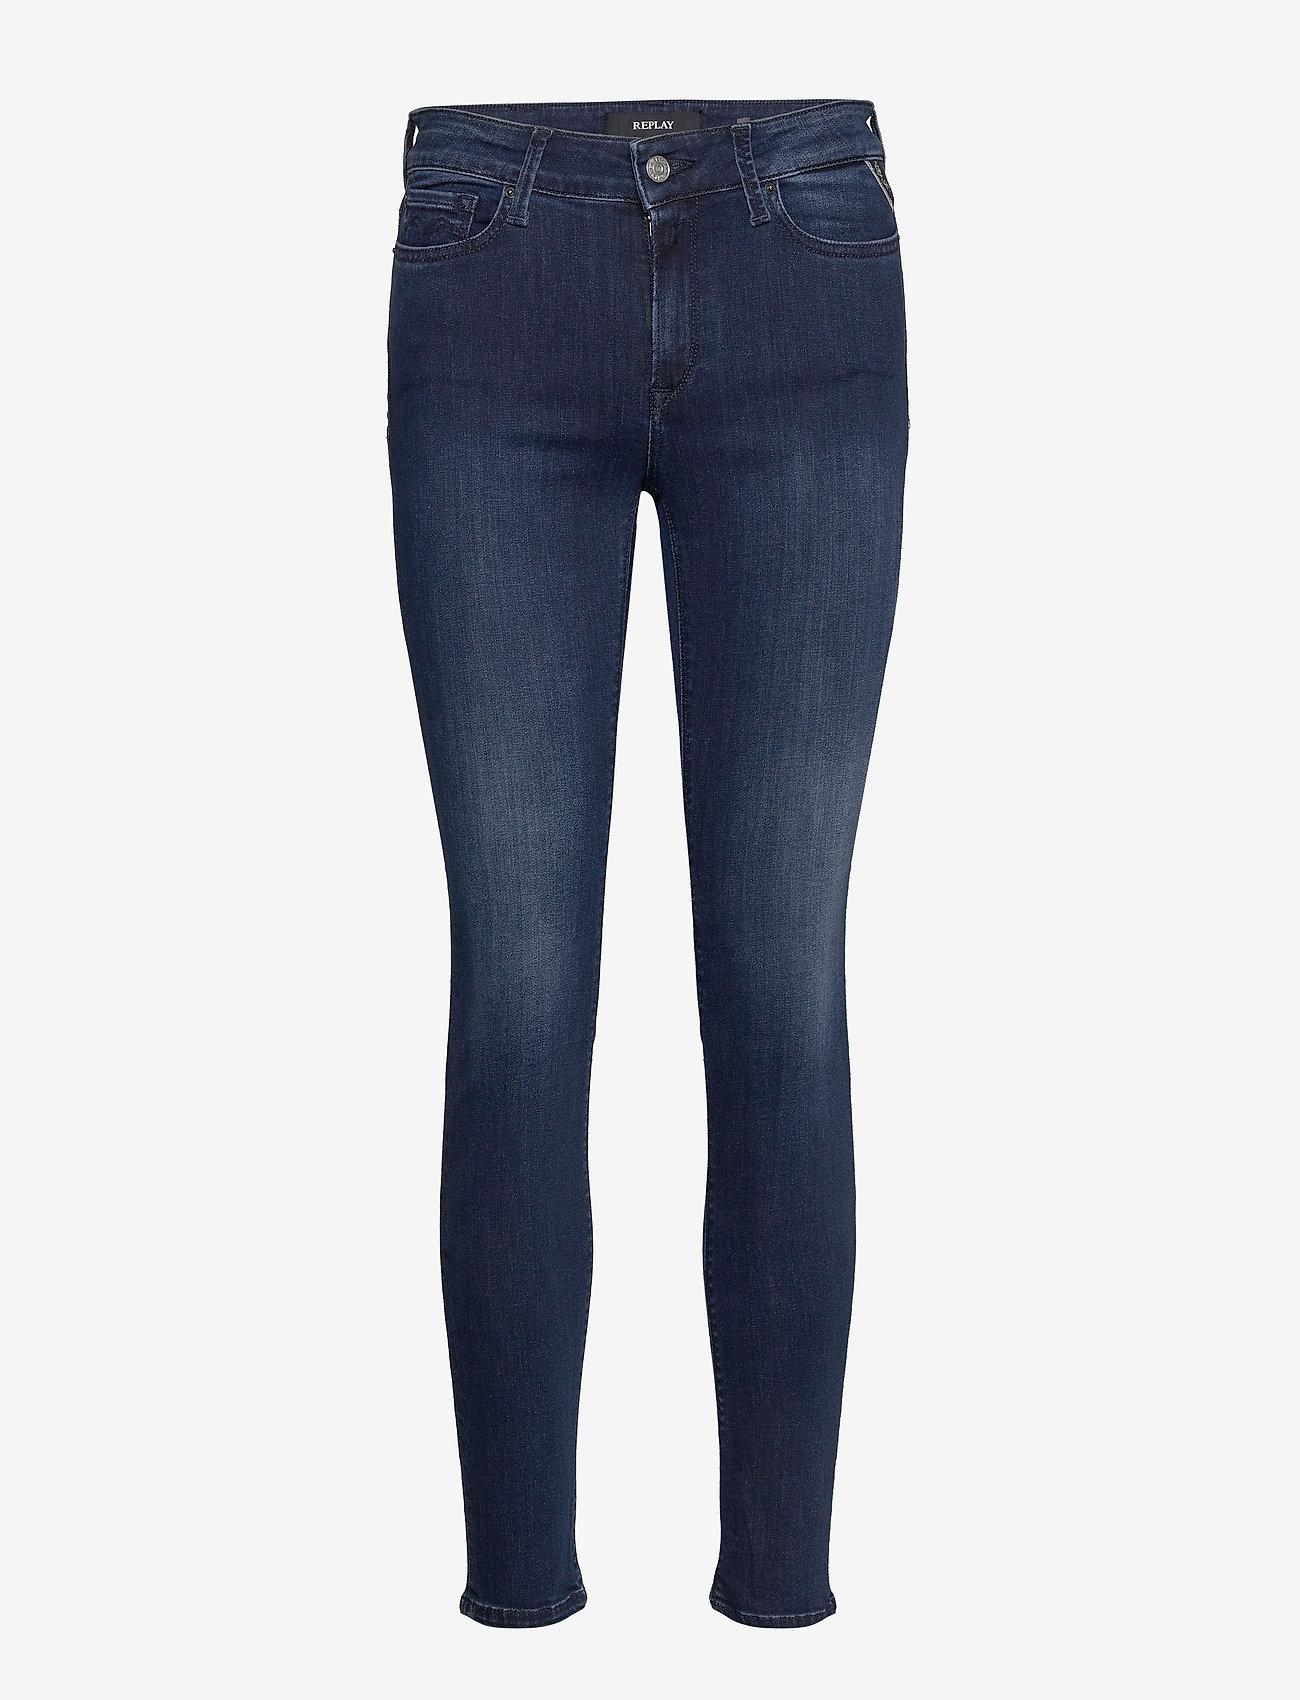 Replay - LUZIEN Trousers 99 Denim - slim jeans - dark blue - 0